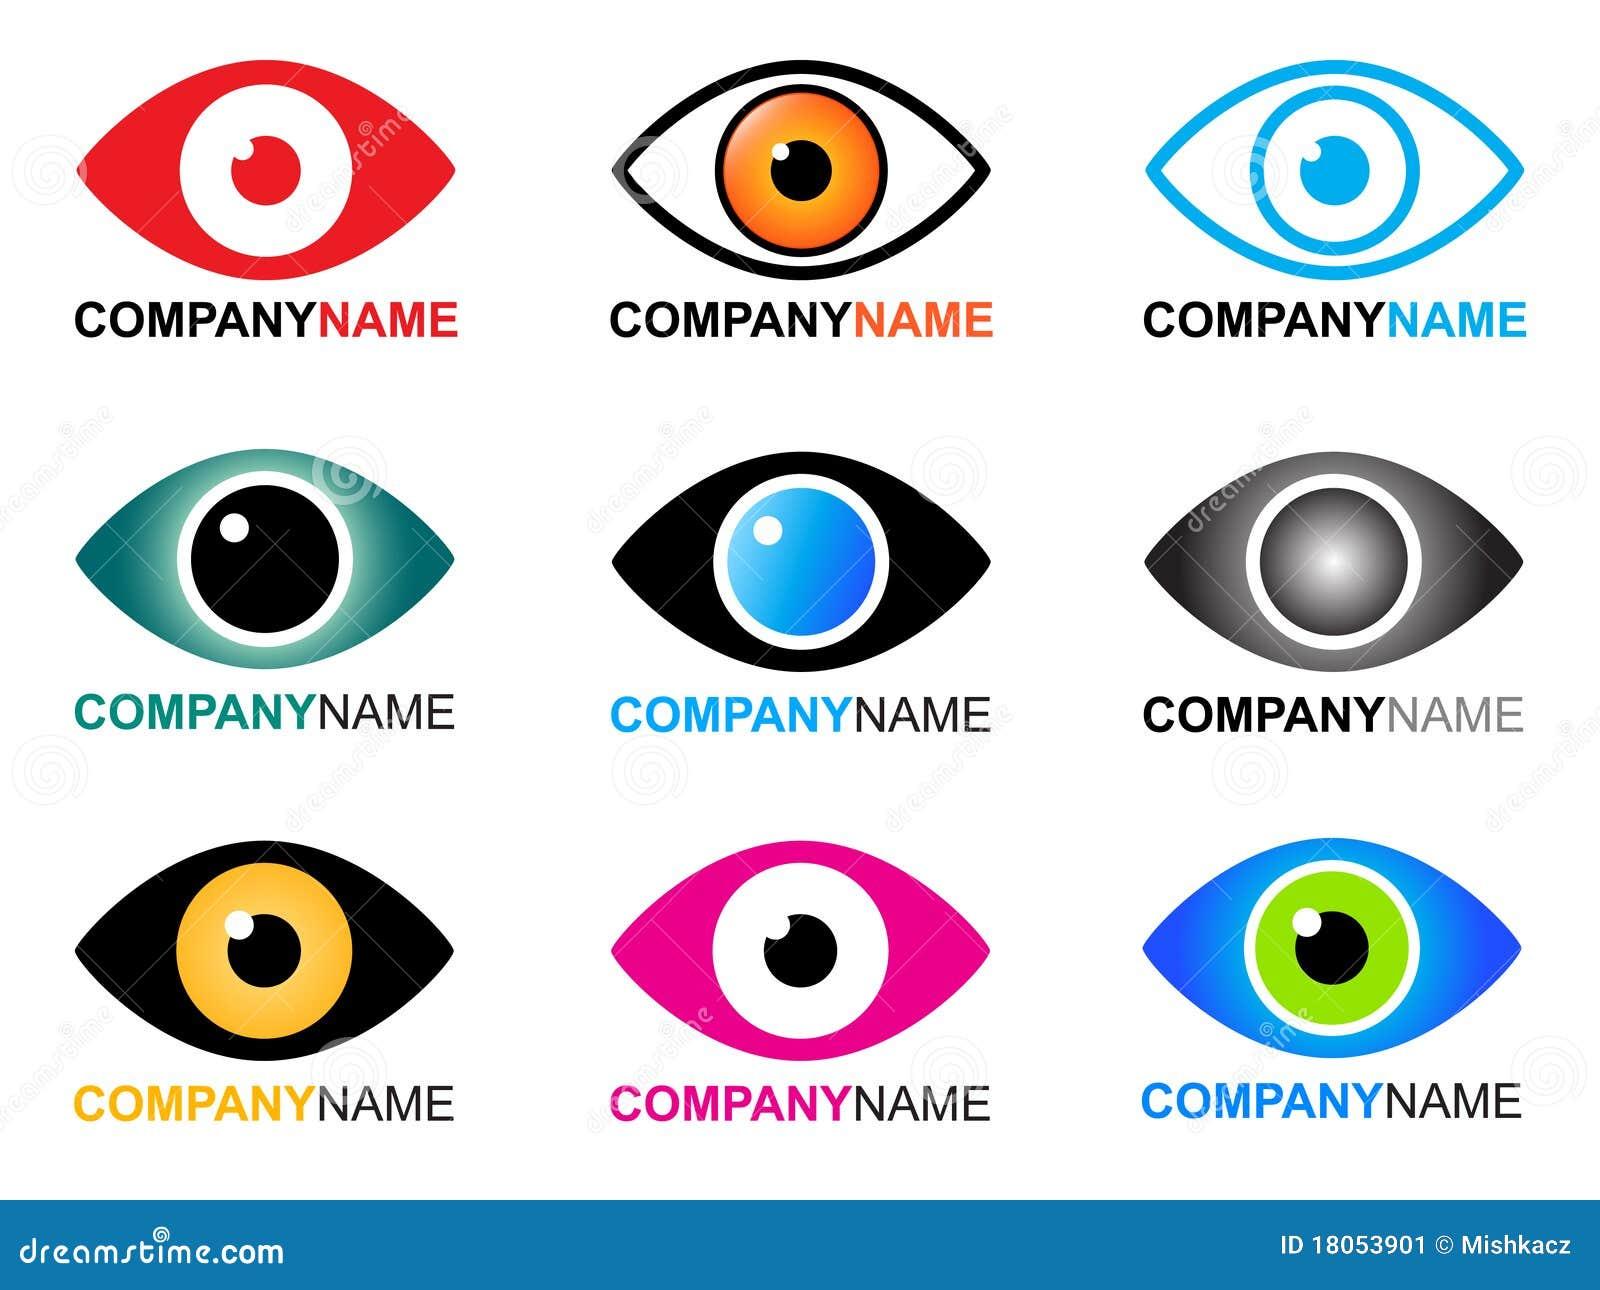 眼睛图标徽标